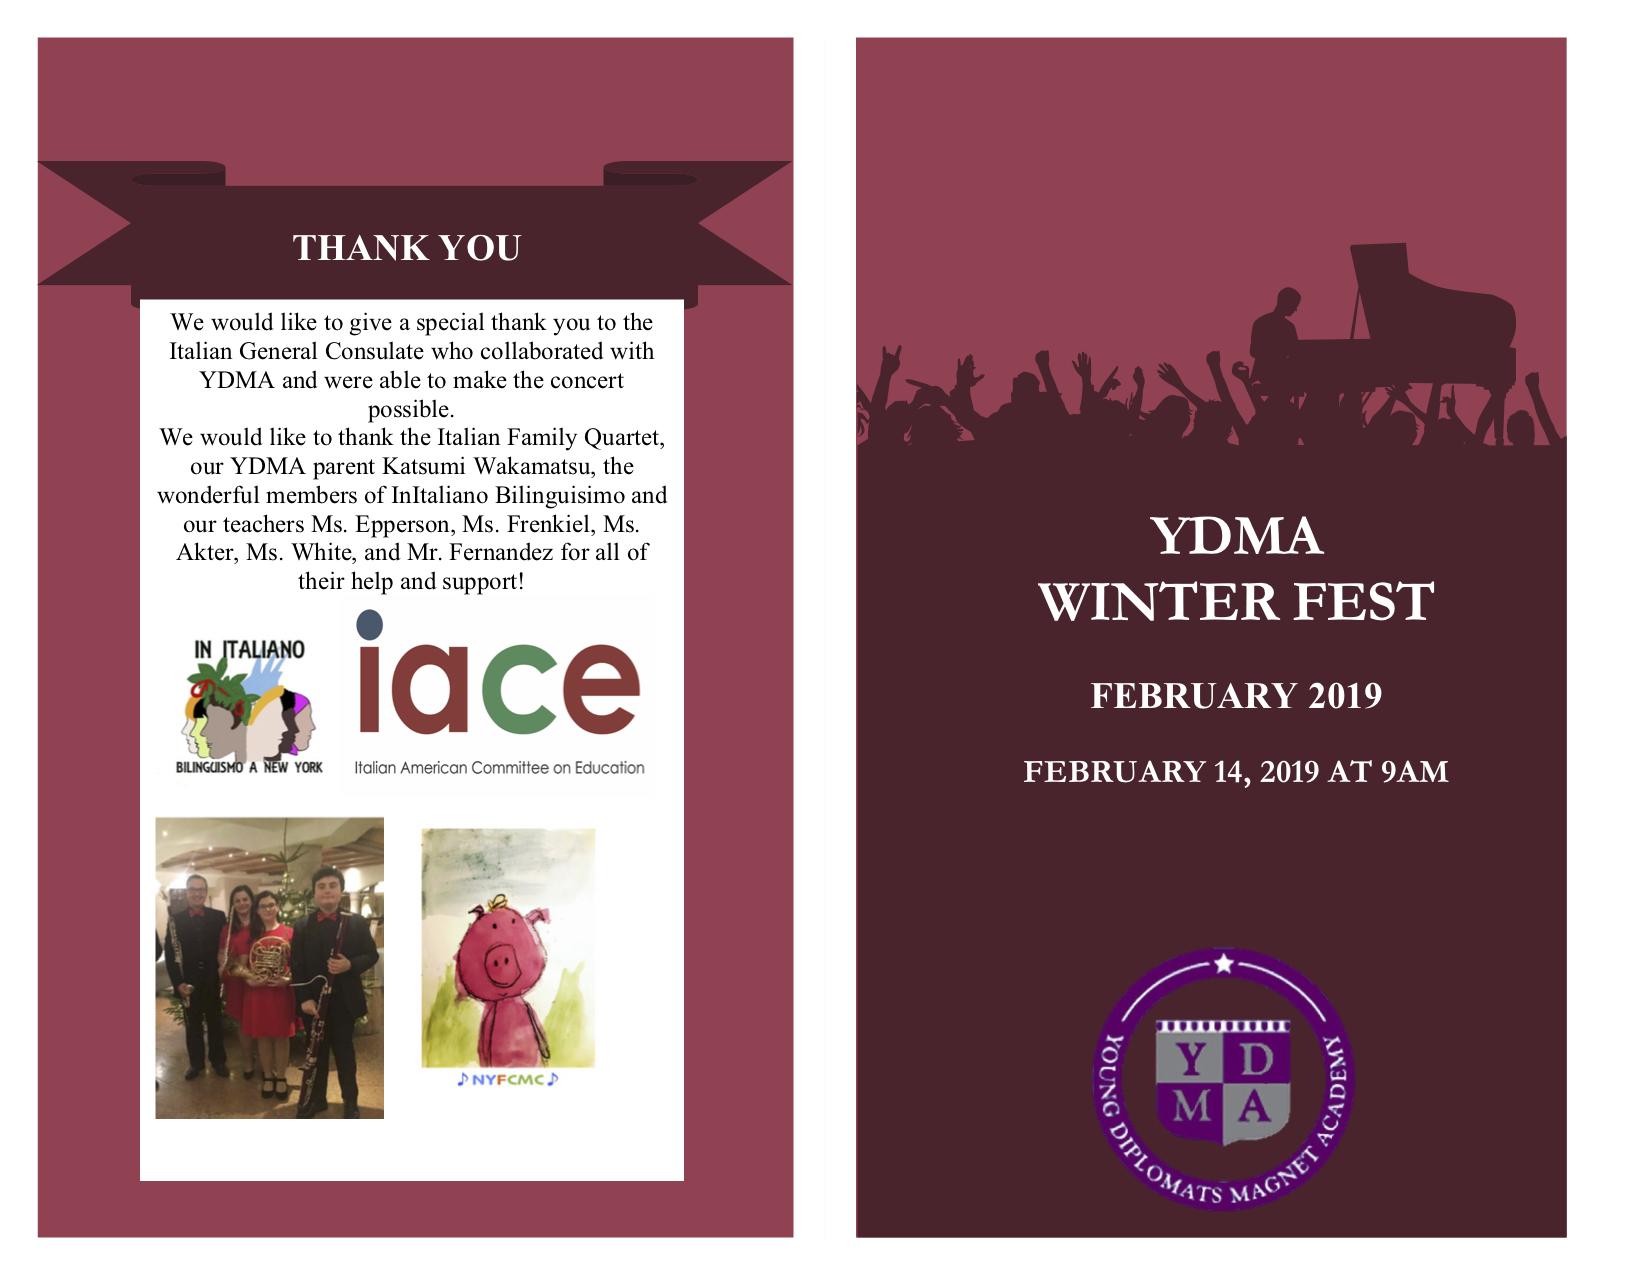 YDMA Winterfest Program.jpg